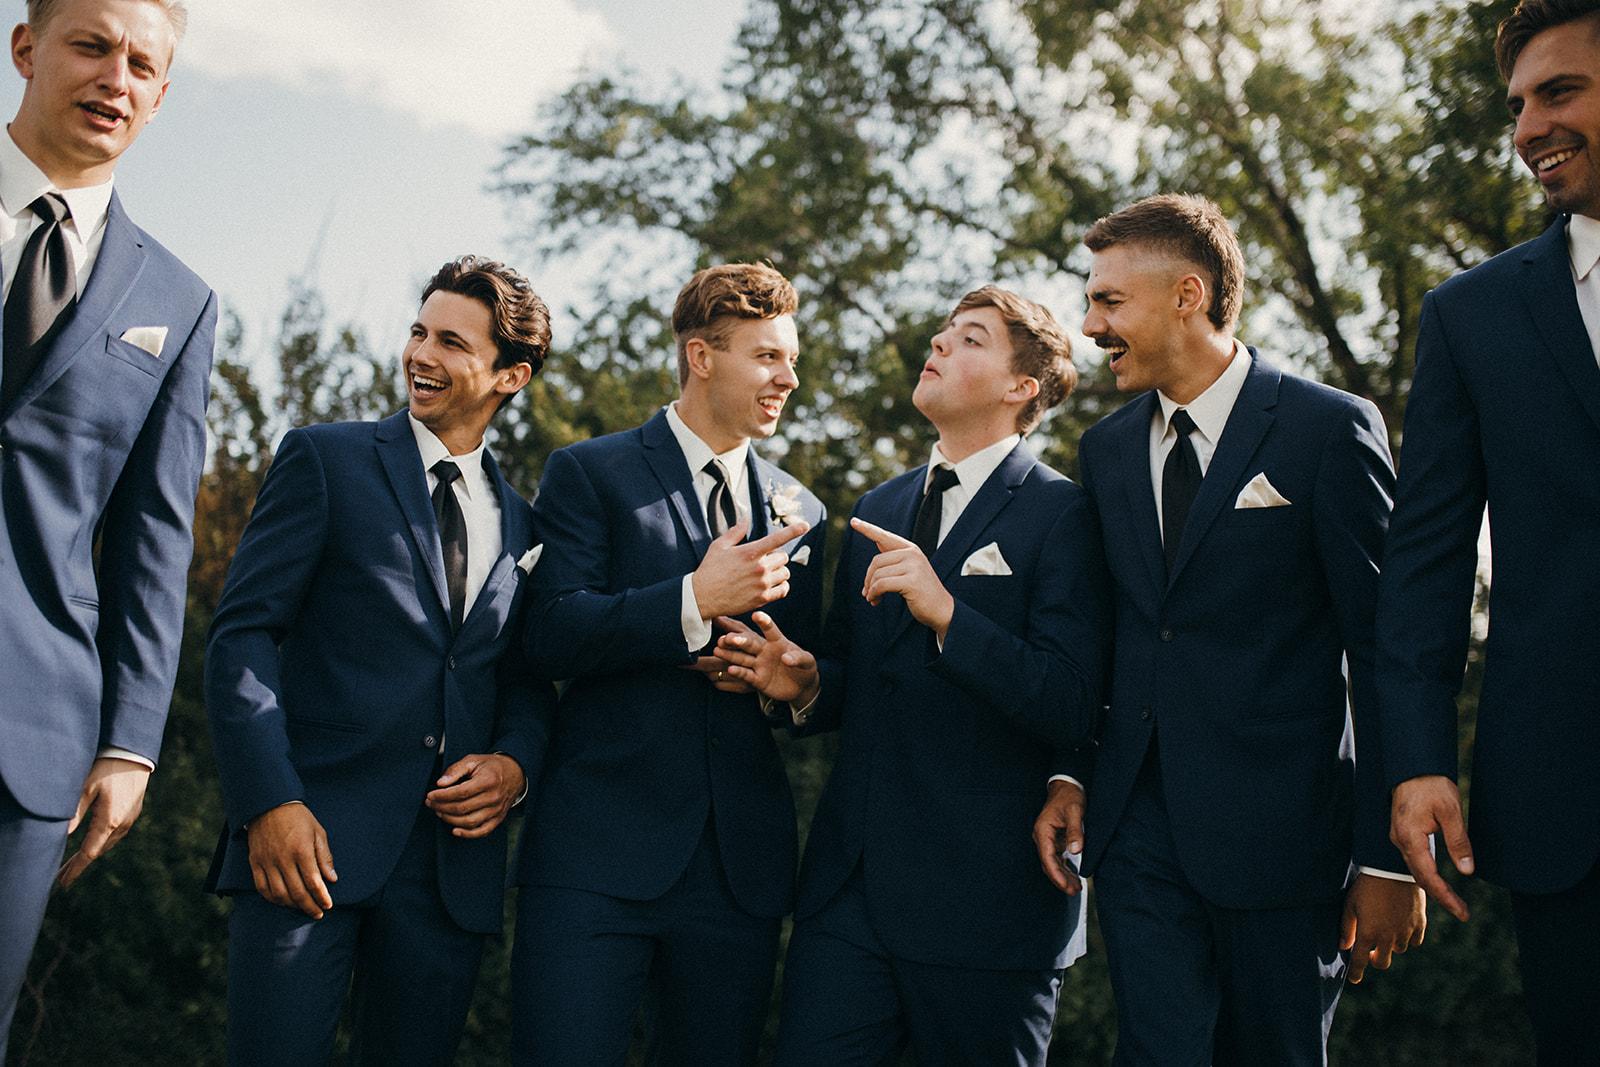 kaden_justine_wedding_3878.jpg